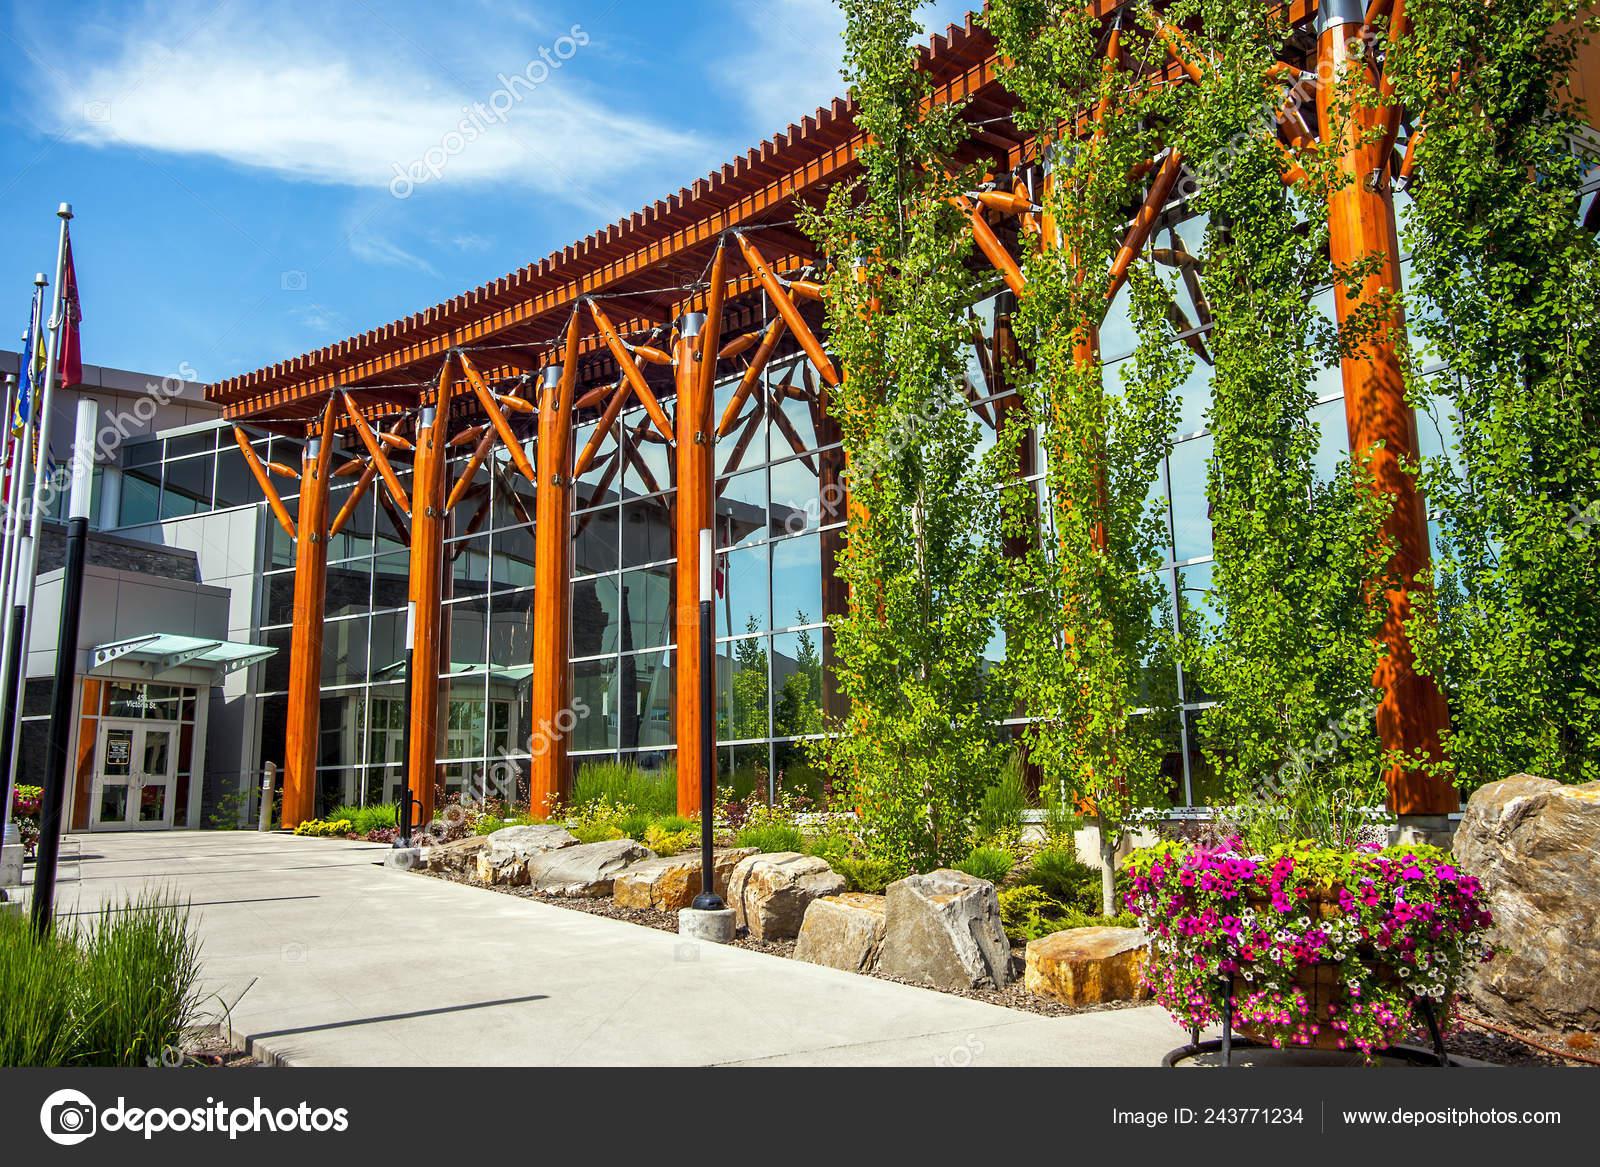 Prince George Canada >> Prince George British Columbia Canada June 2018 Building